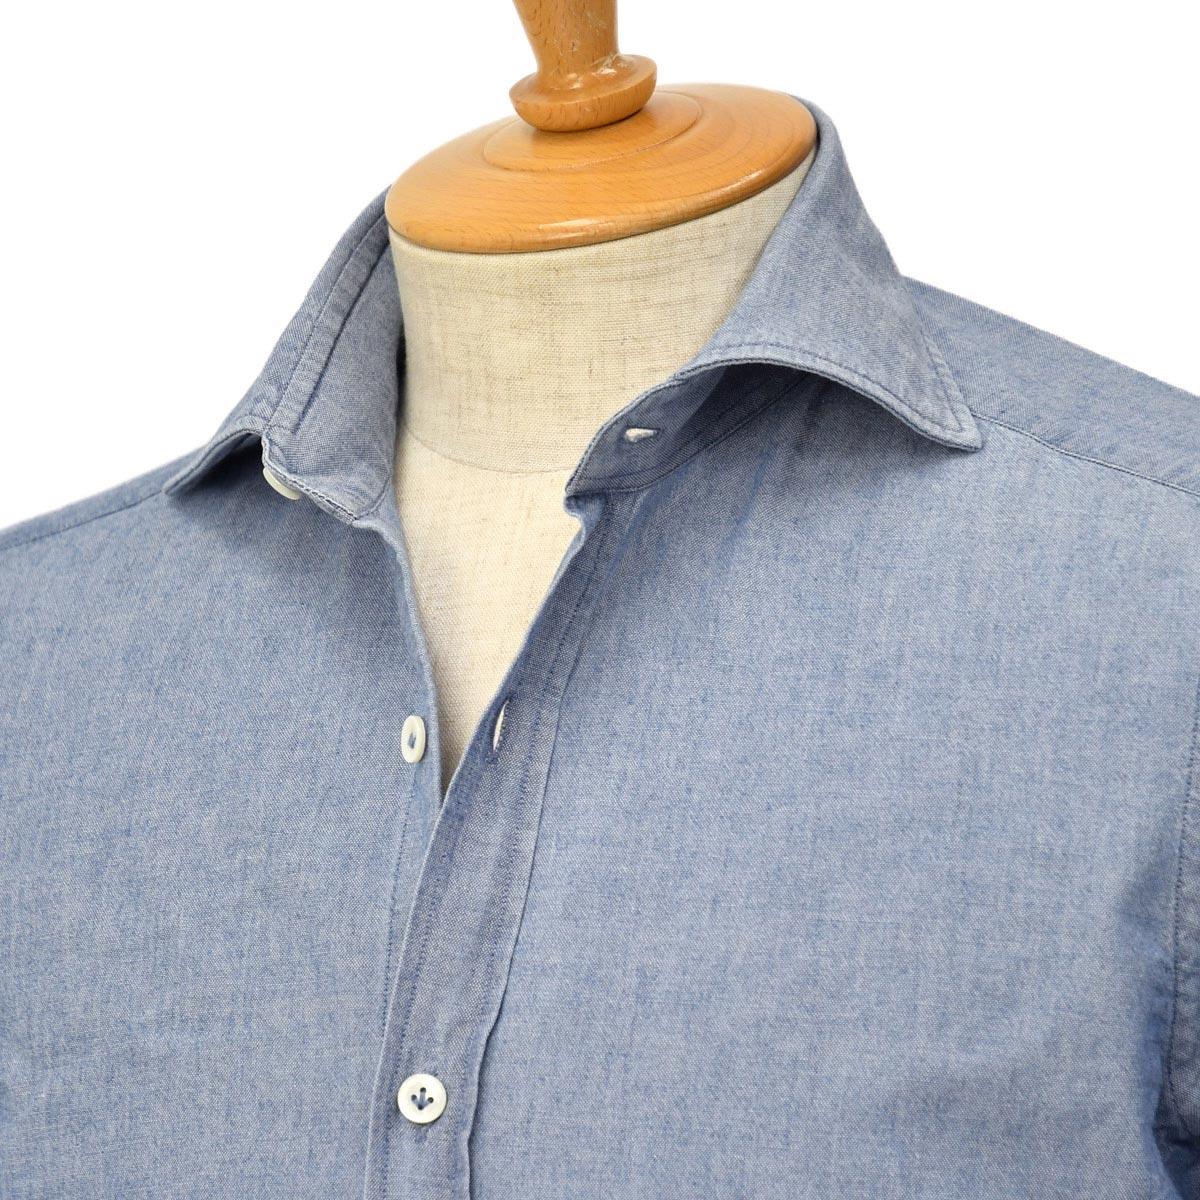 【30%OFF】【size40】Giannetto【ジャンネット】シャンブレーシャツ VINCIFIT 0103-354370V81 0006 コットン インディゴ